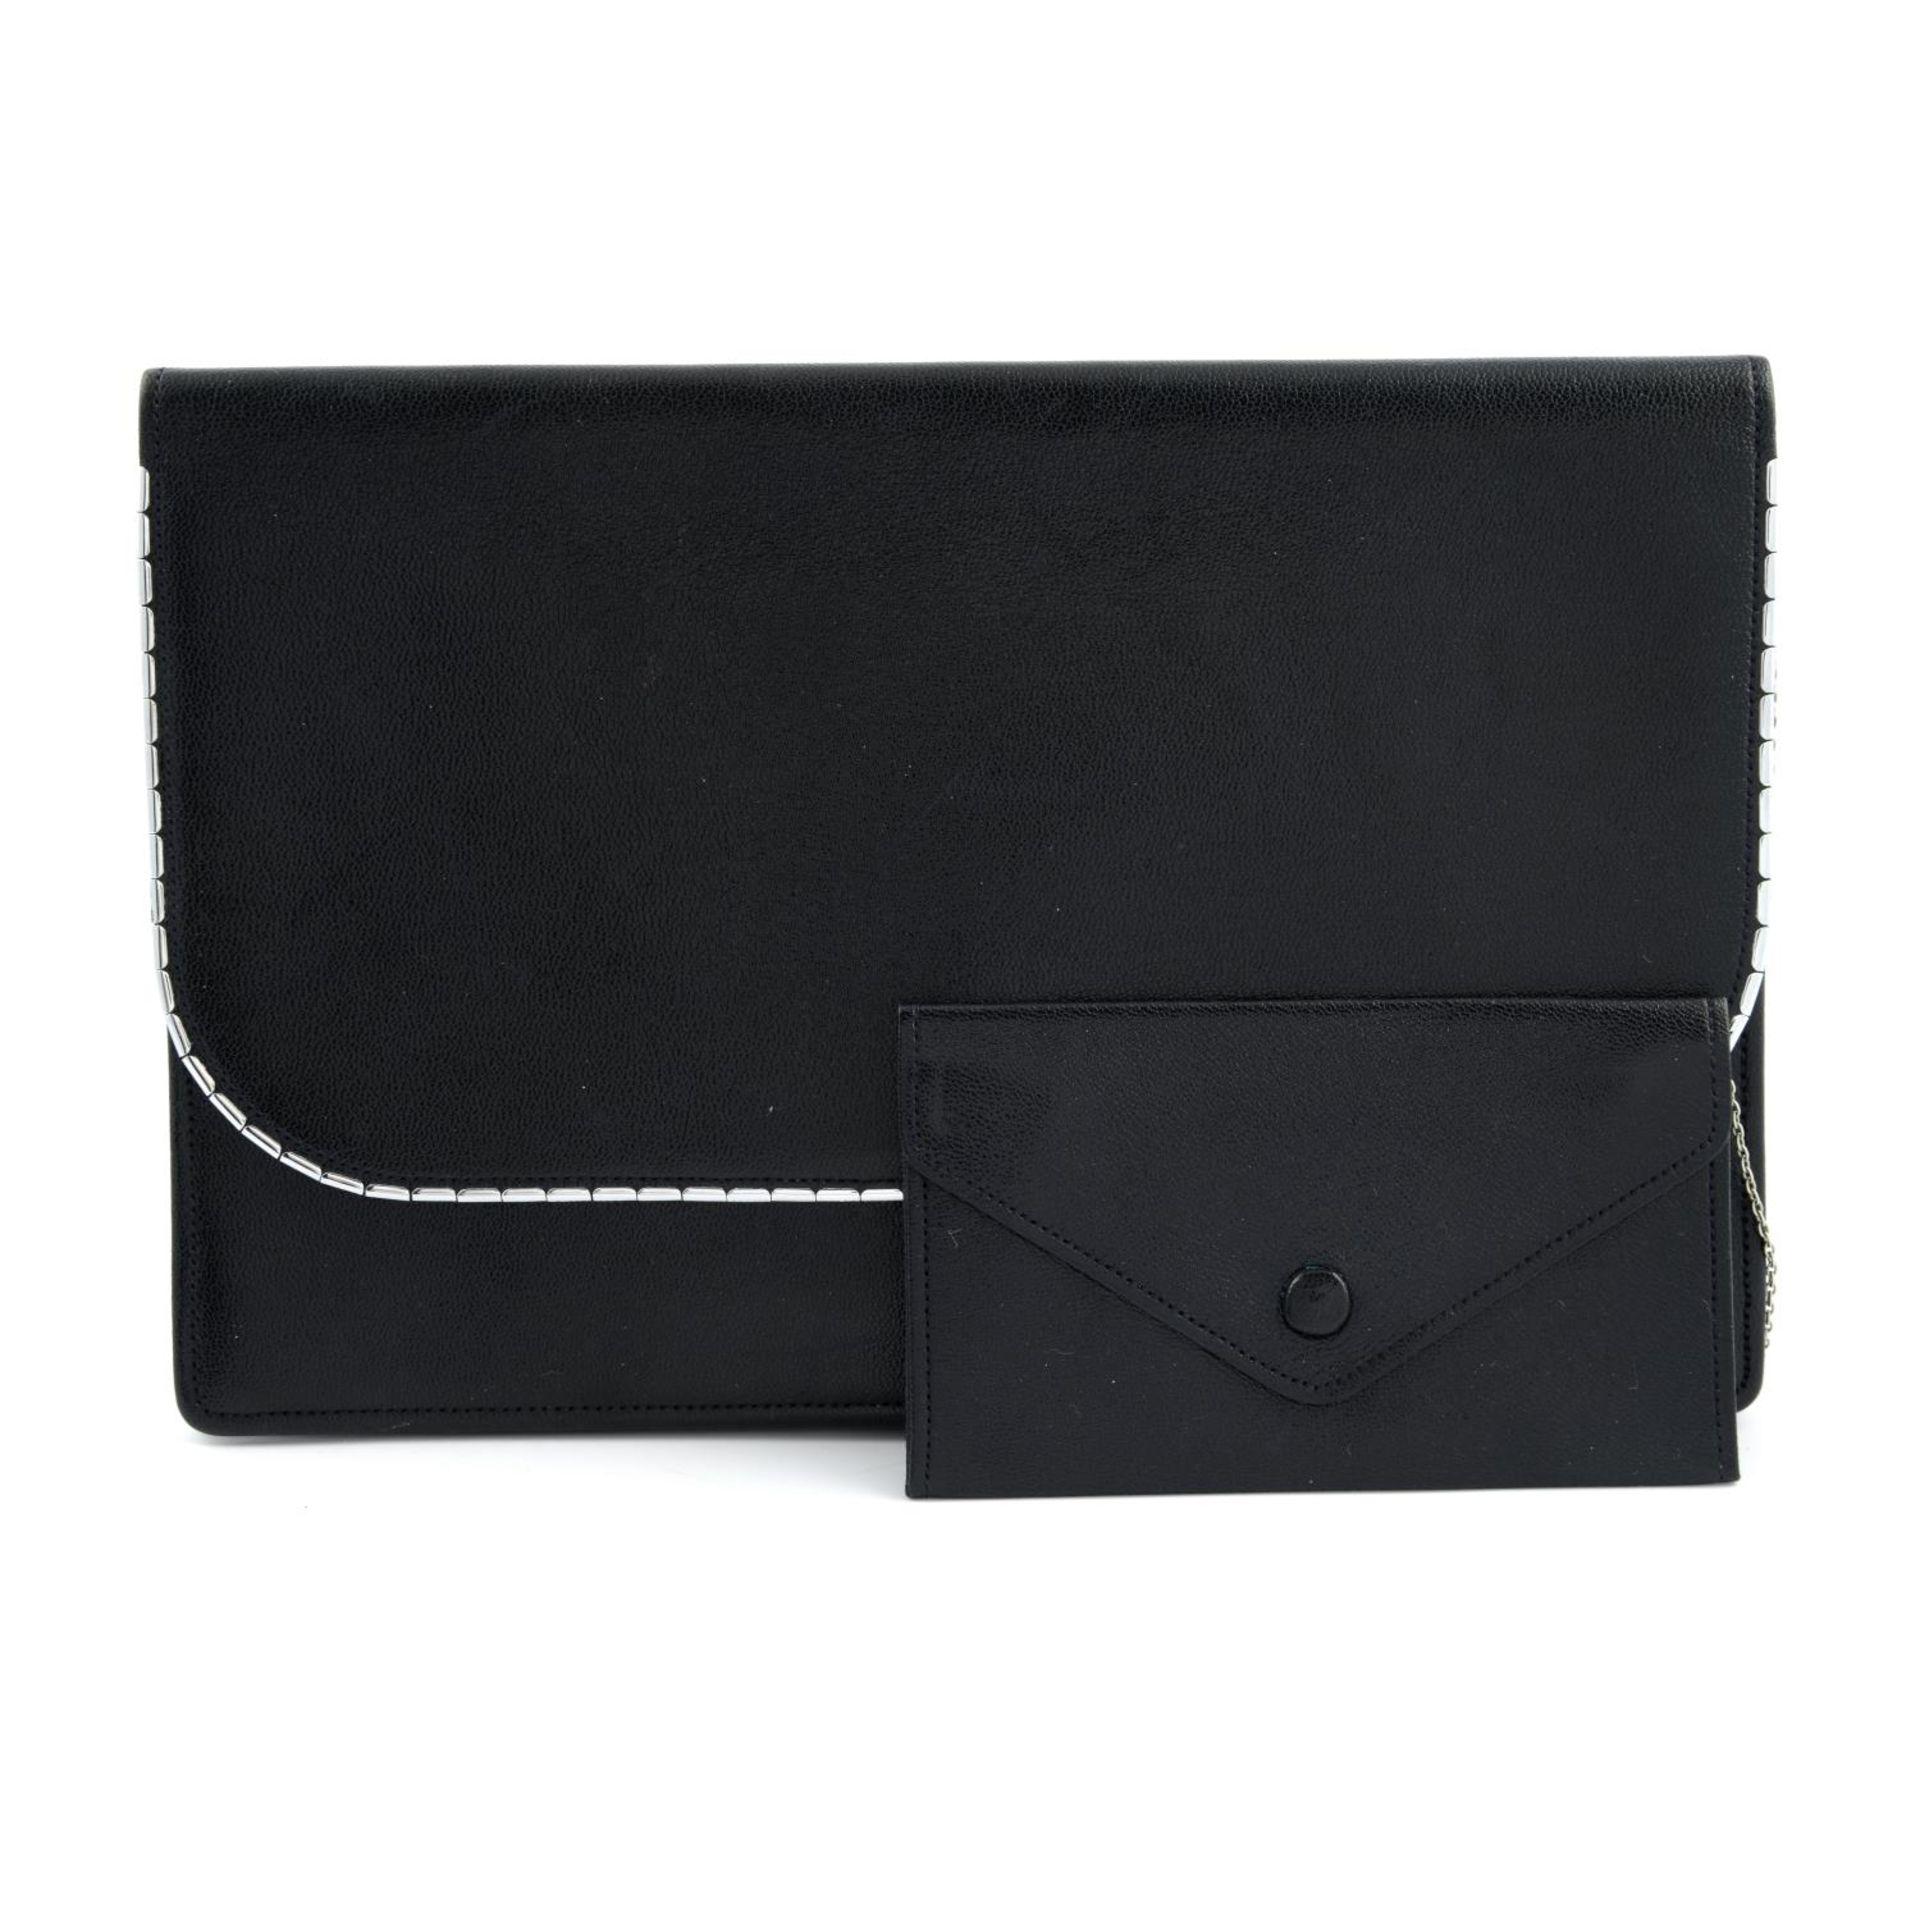 ASPREY - a vintage leather clutch.